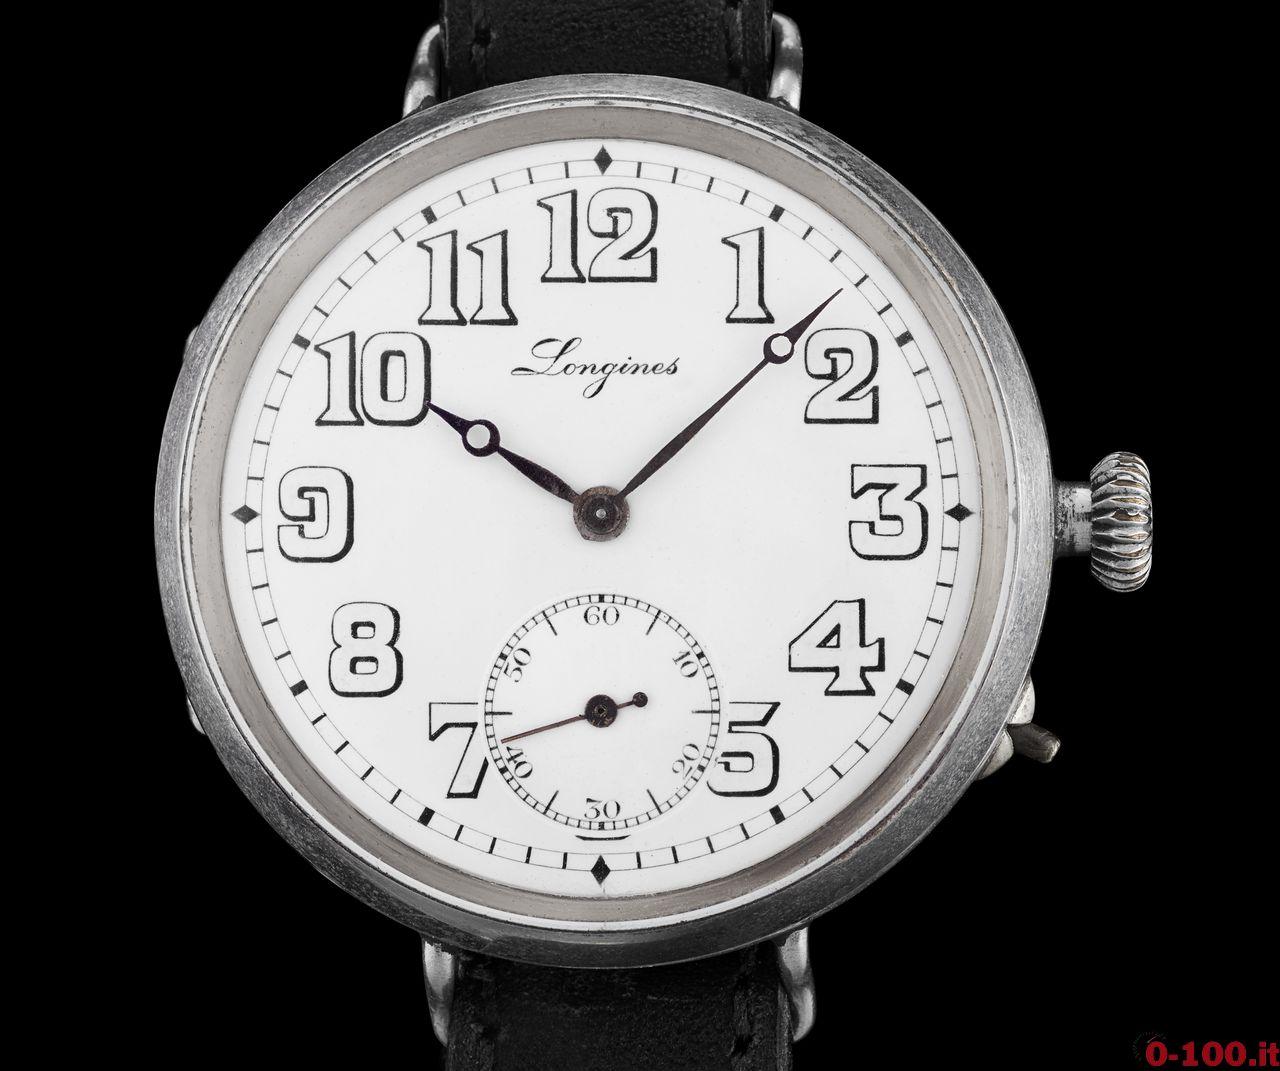 the-longines-heritage-military-ref-l2-811-4-53-03-prezzo-price_0-1004